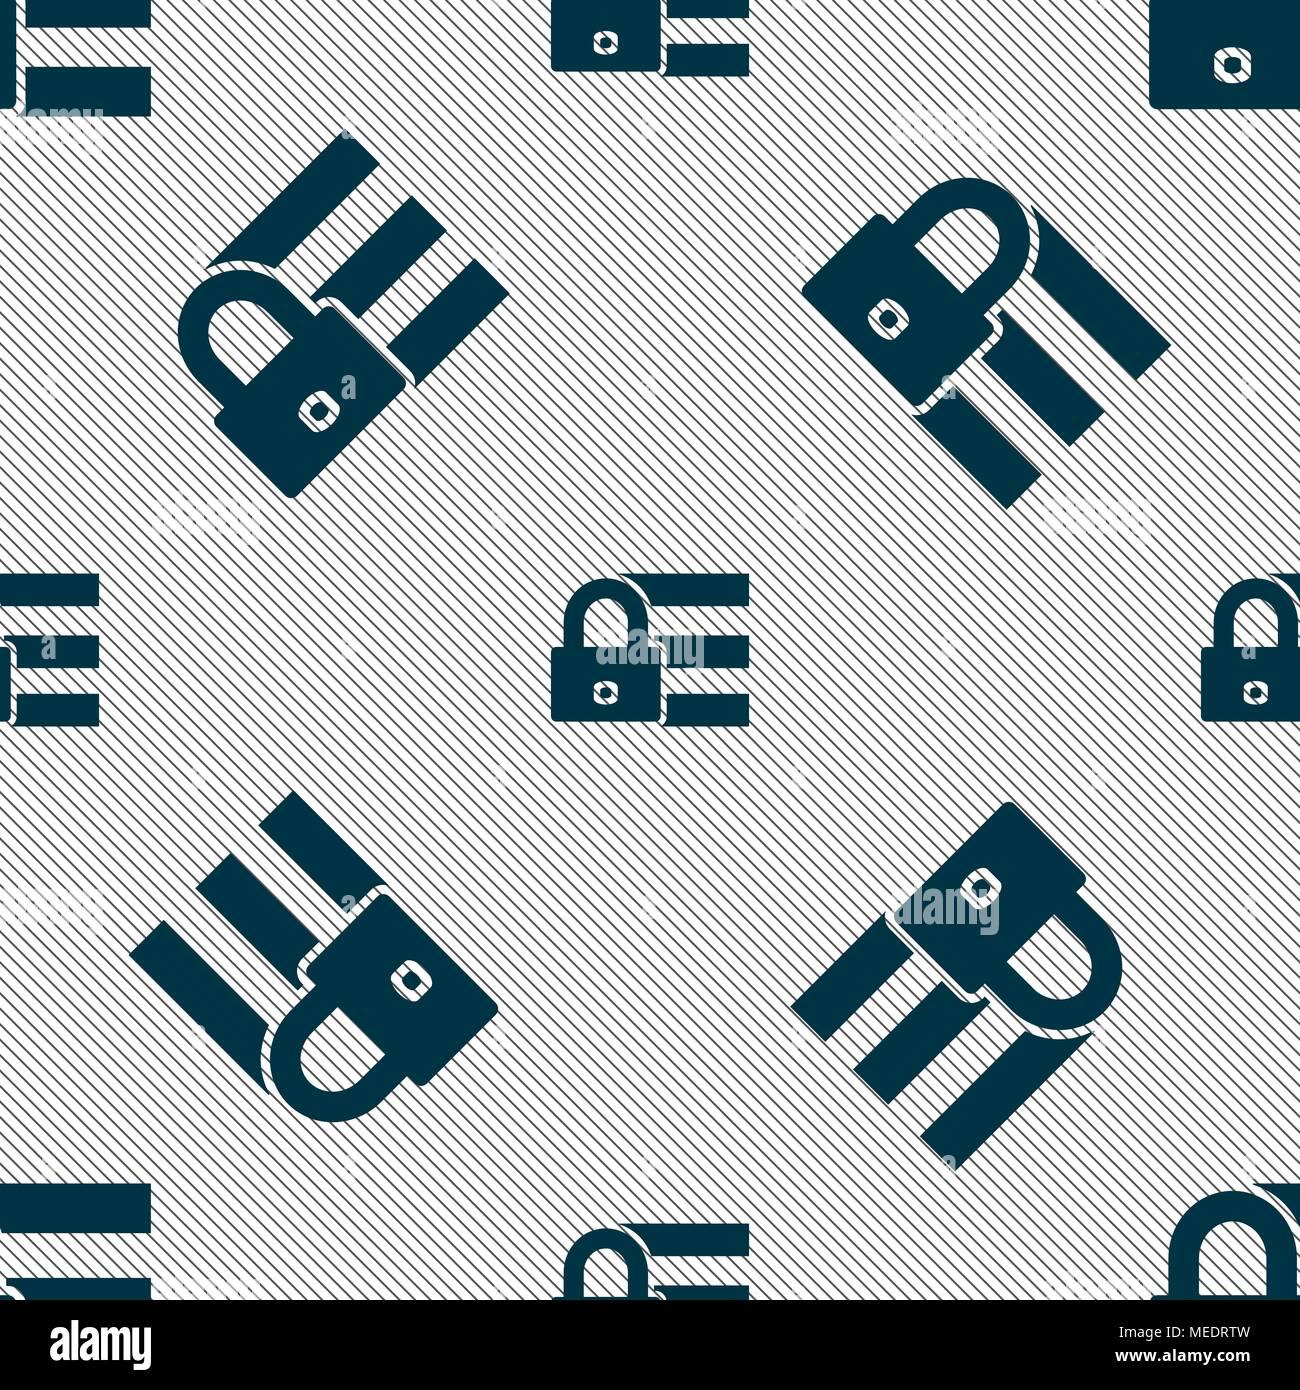 lock login icon sign seamless stock photos lock login icon sign